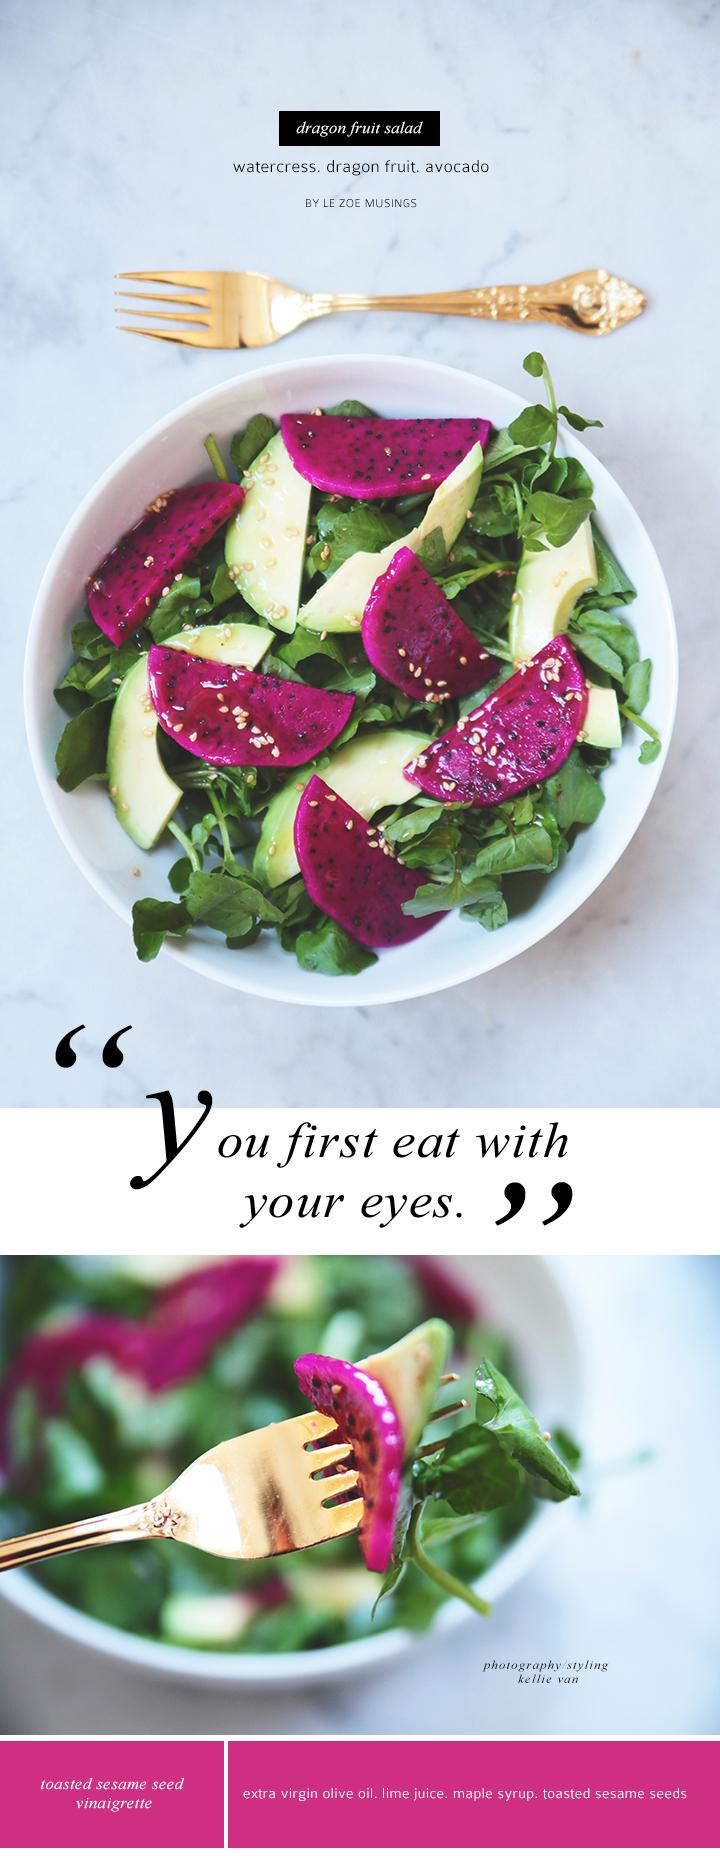 dragon fruit salad by le zoe musings